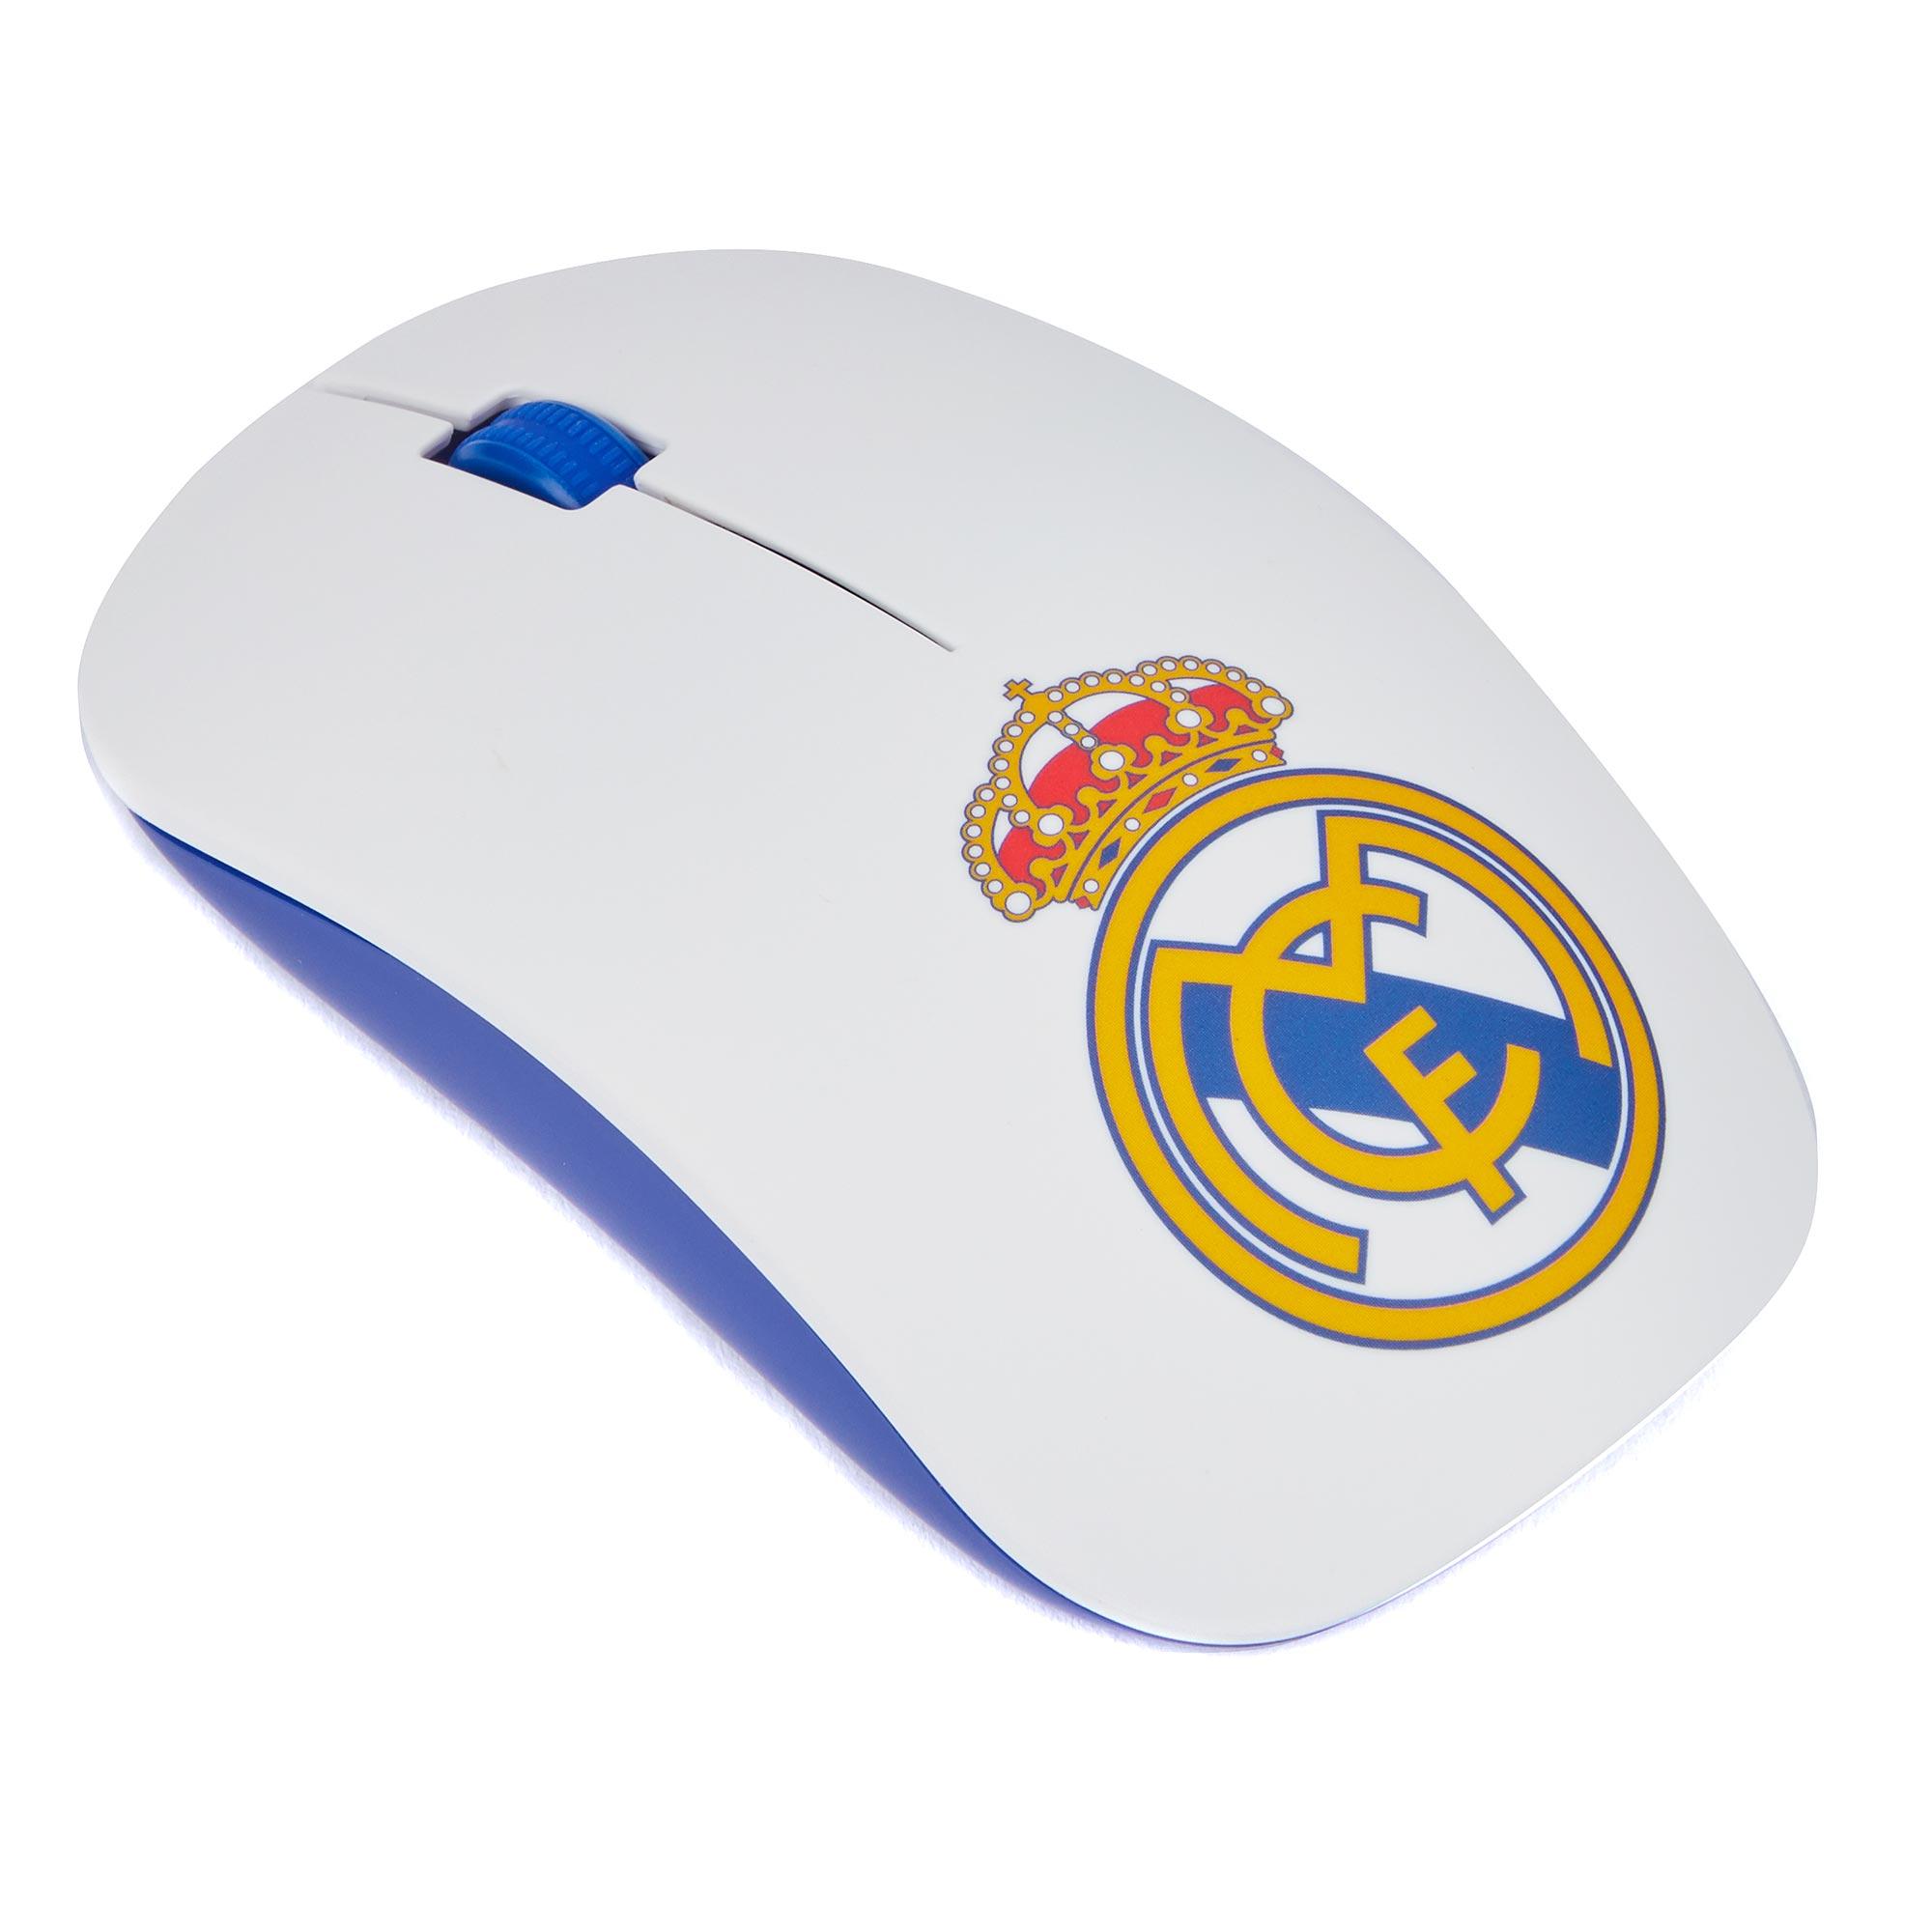 Quam License S.L / Real Madrid Crest Optical Mouse